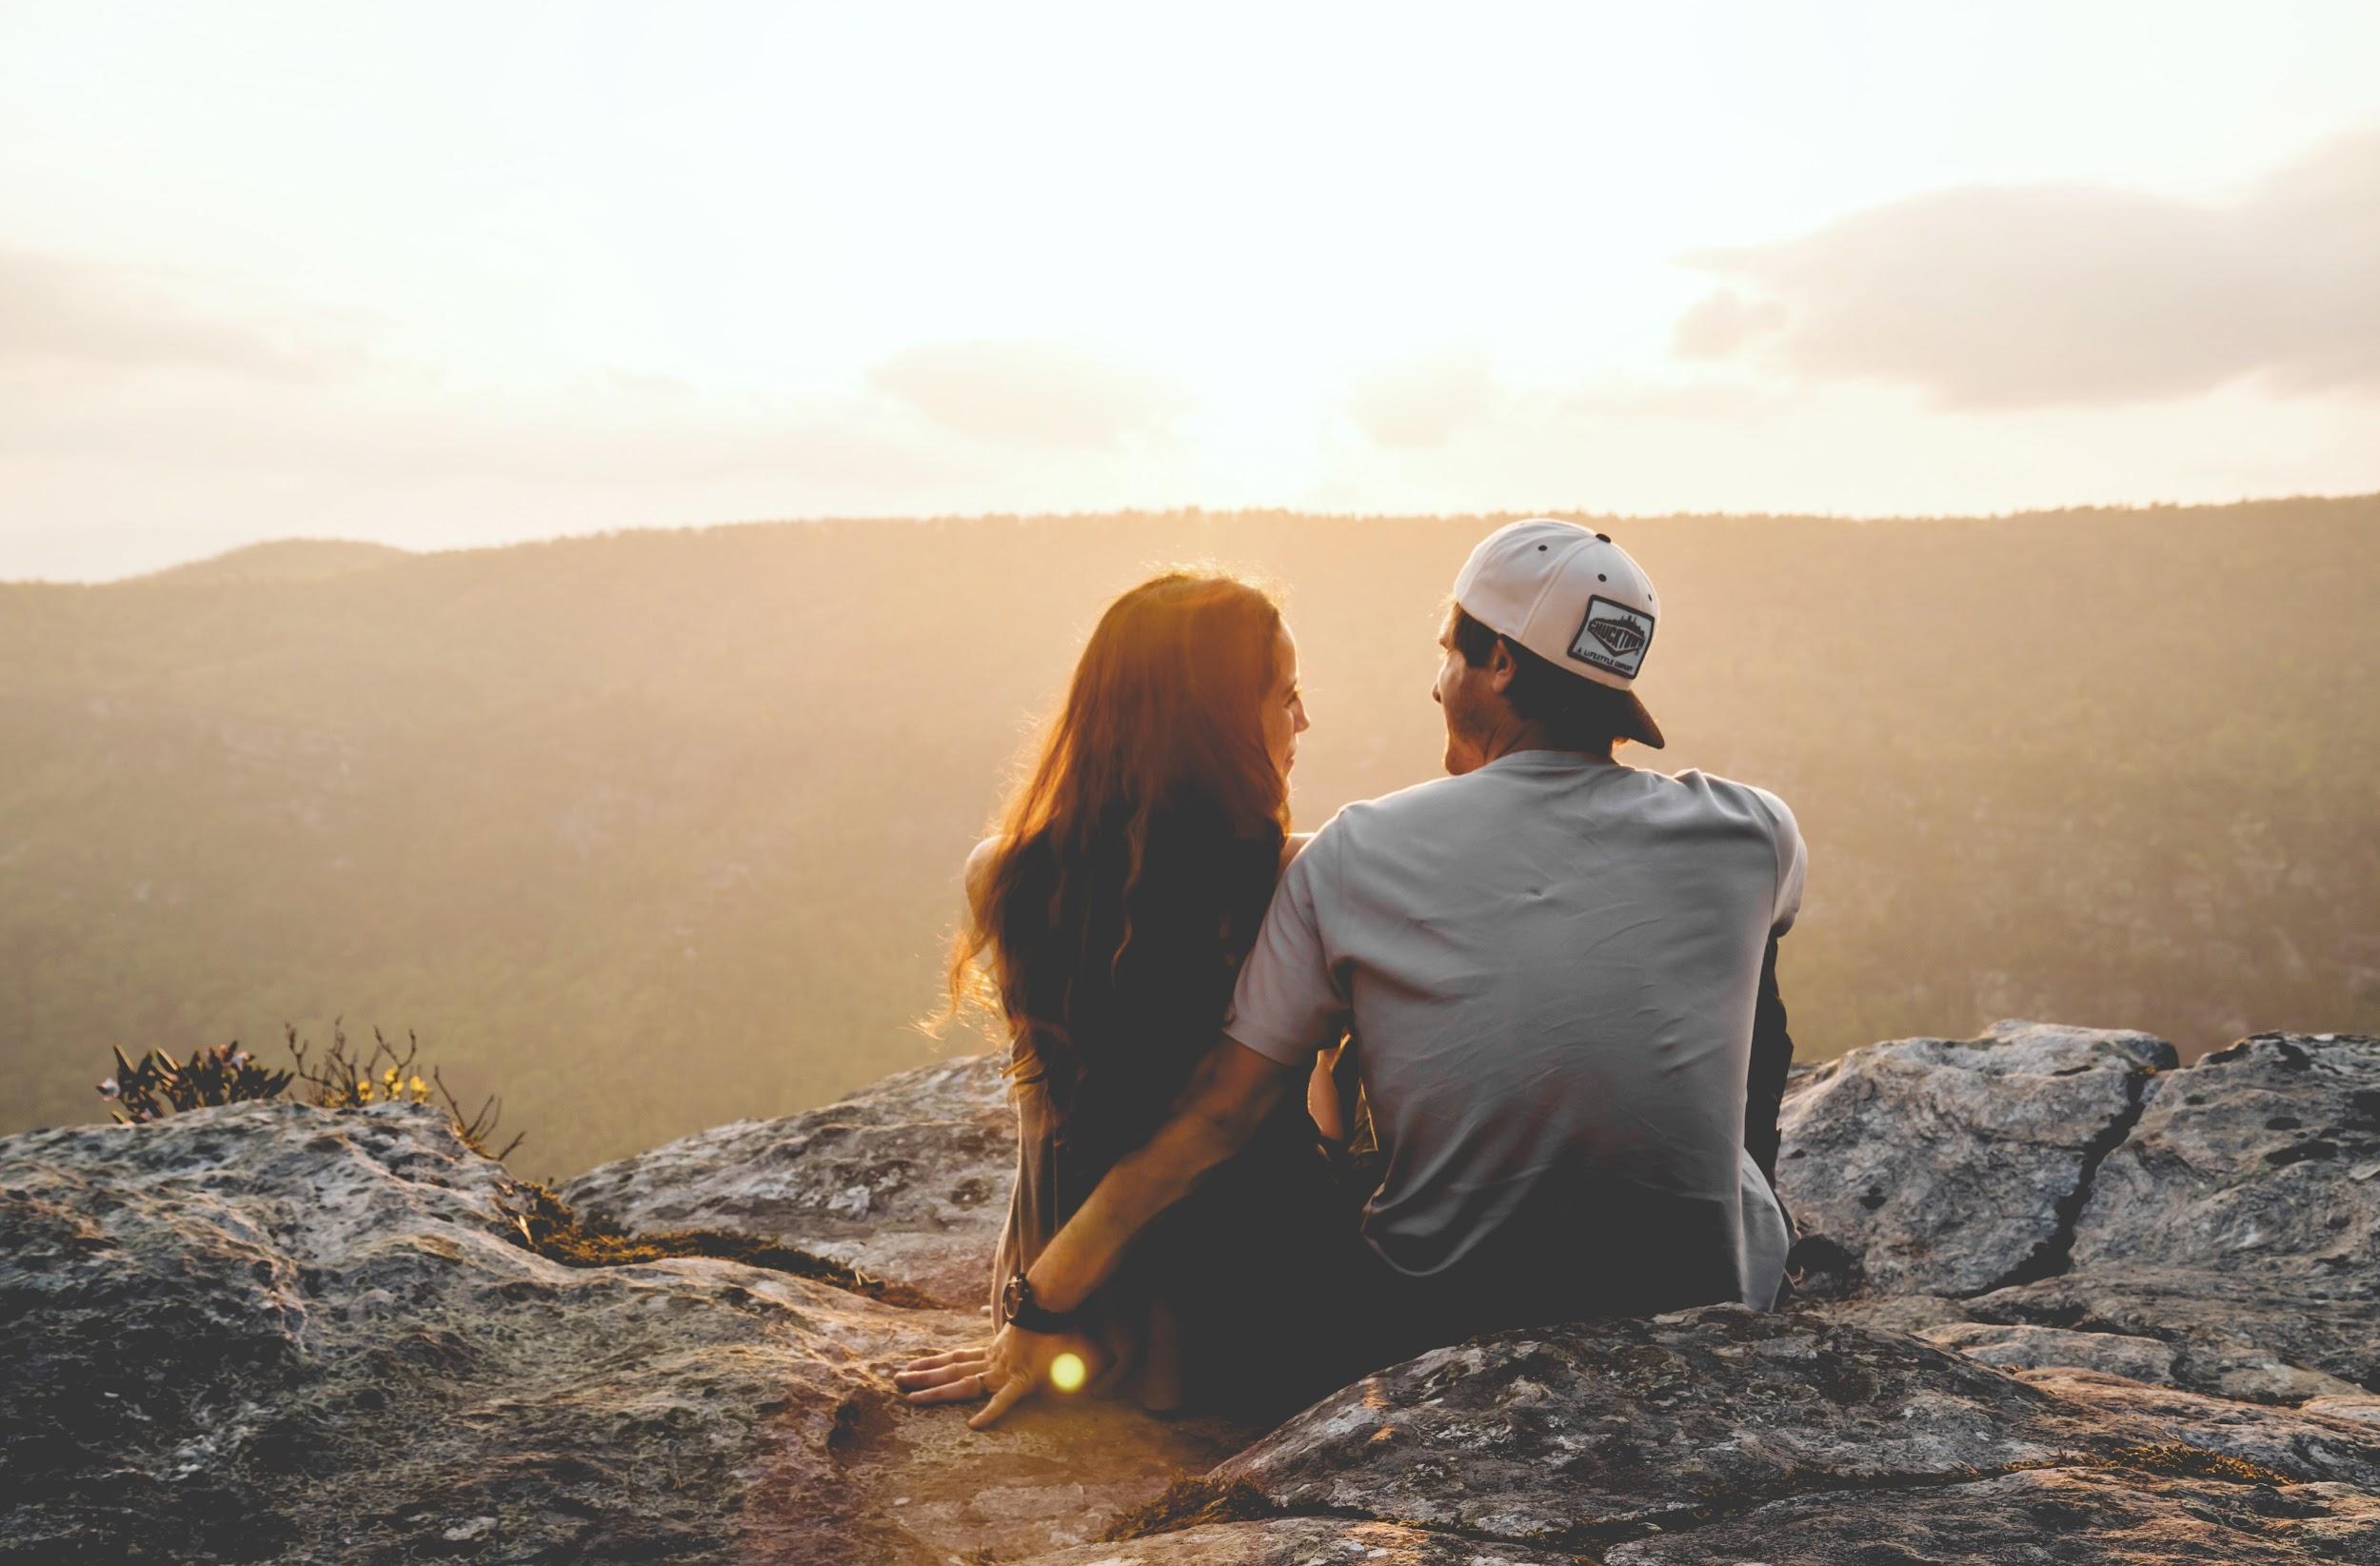 7 Relationship goals all couples should strive for